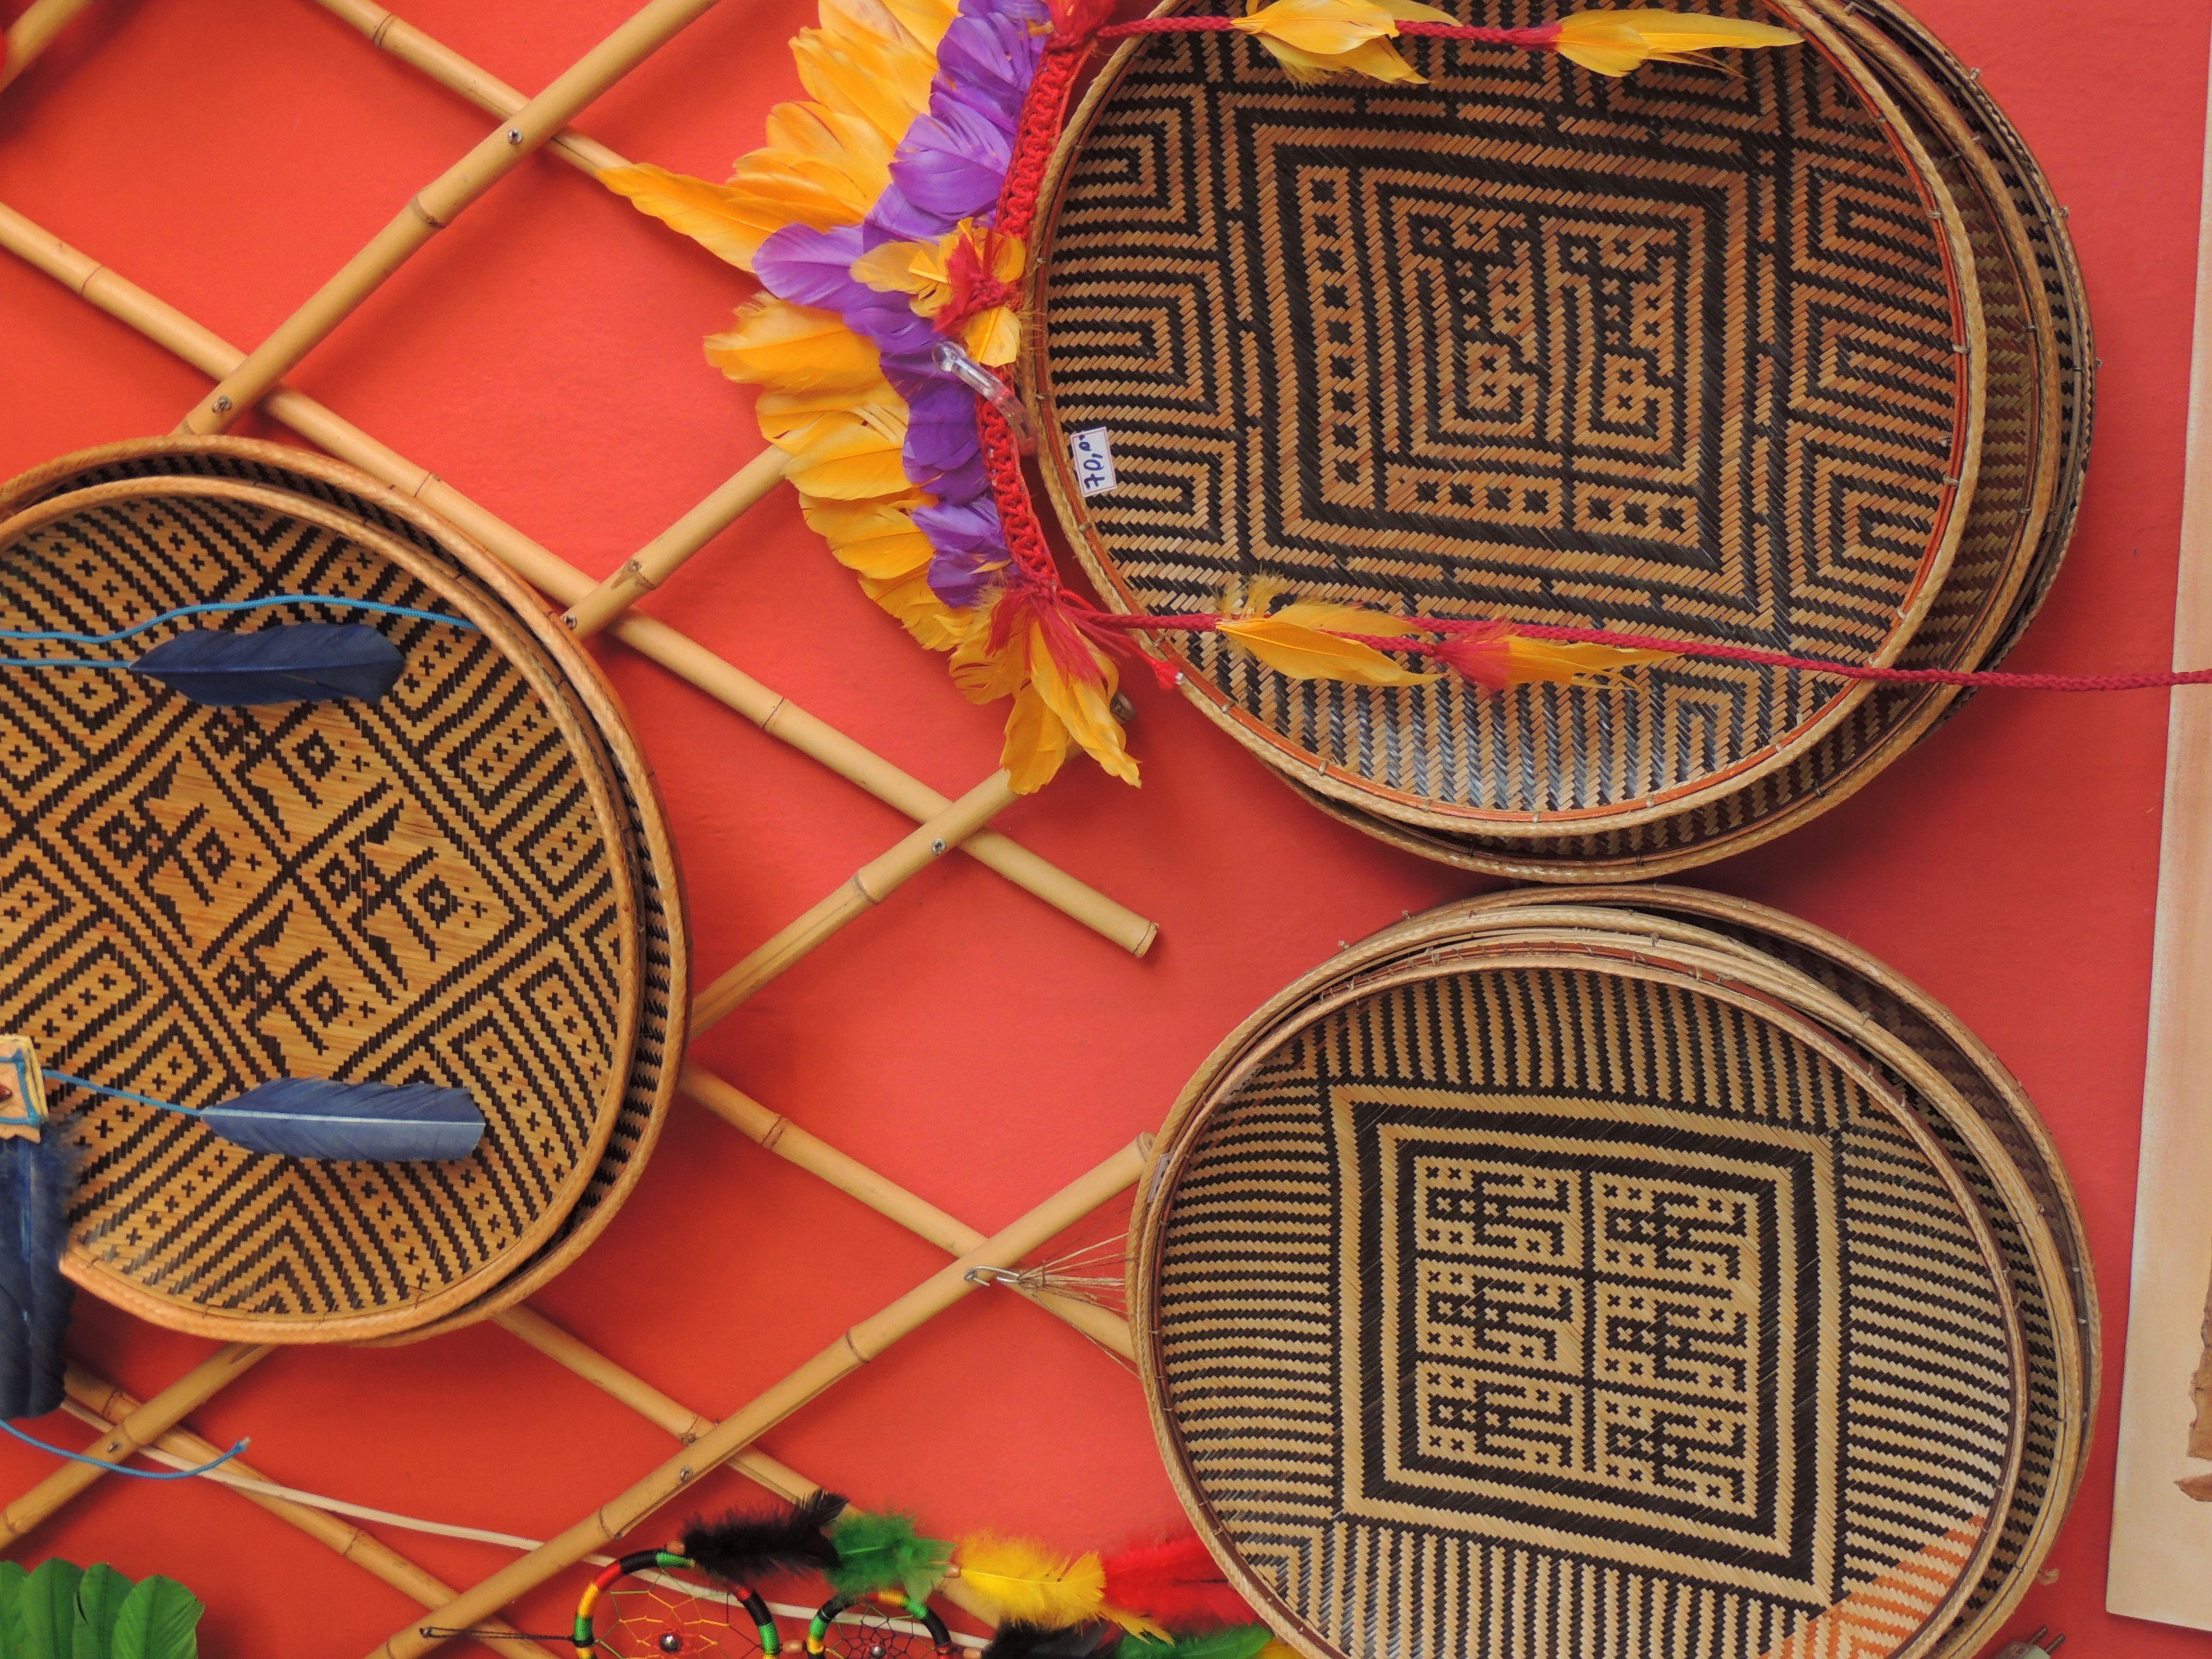 Armario Exterior ~ Artesanato indígena de Roraima, Brasil Artes e Pintura Pinterest Indígena, Grafismo